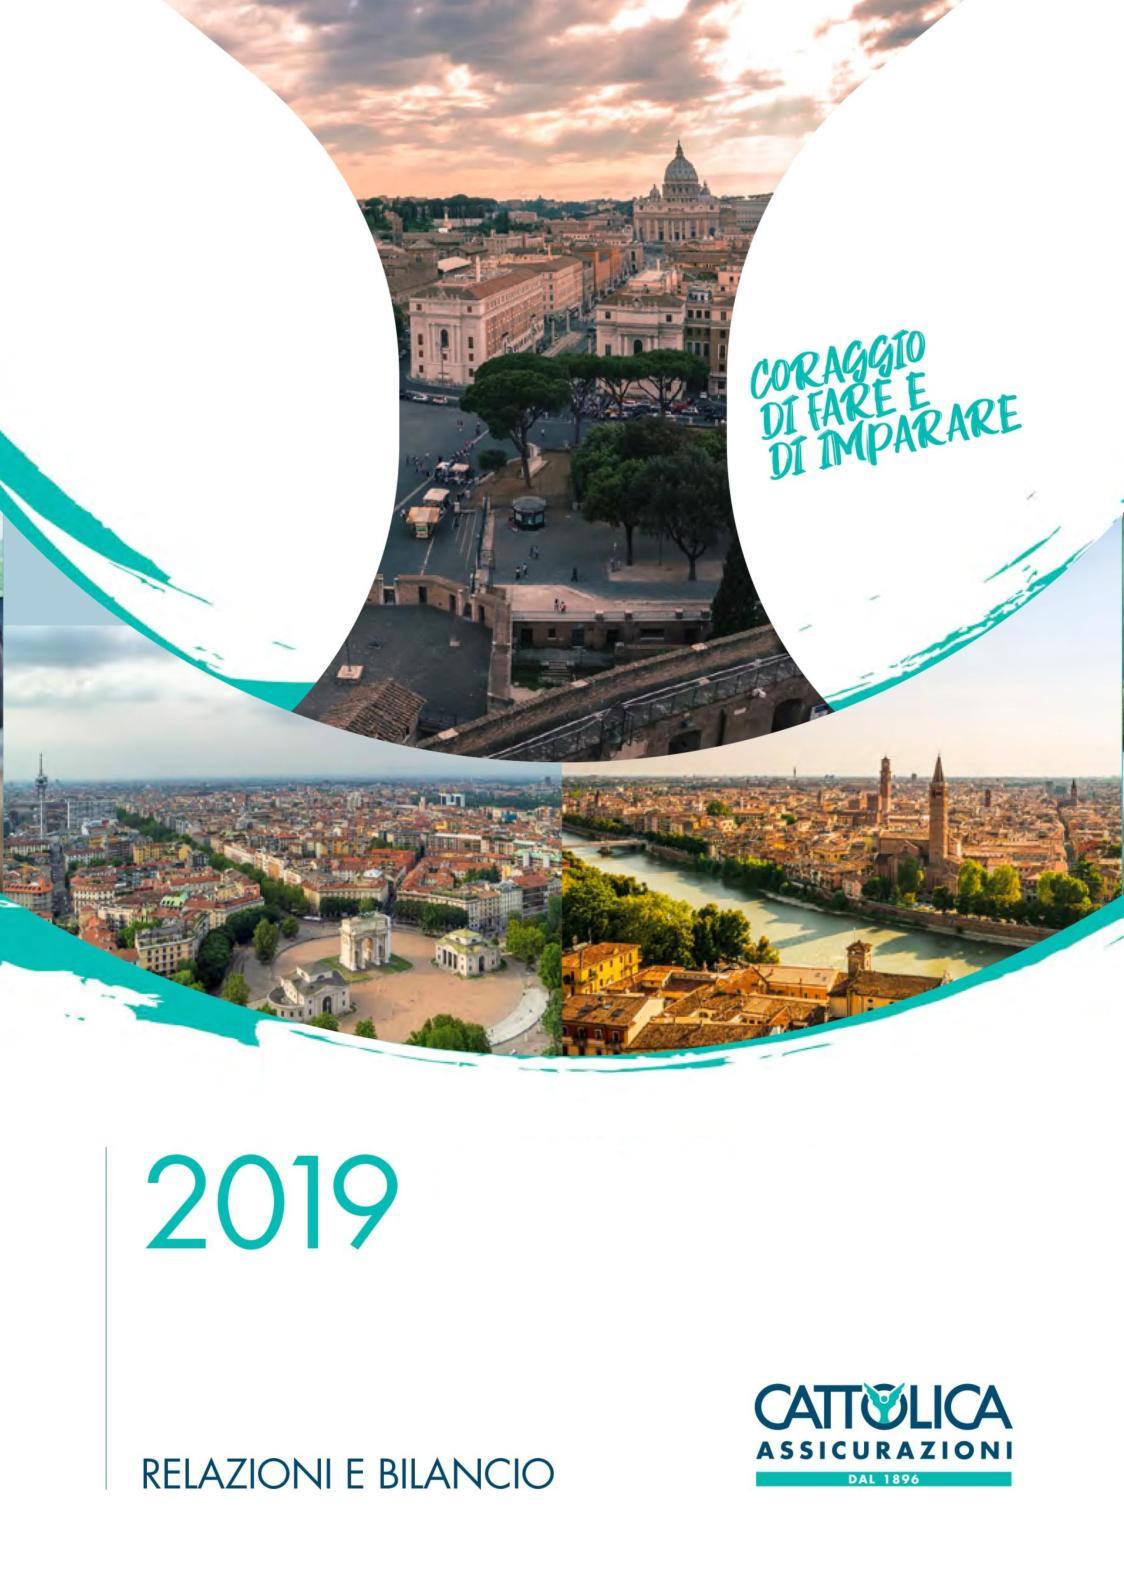 calaméo - cattolica bilancio 2019  calaméo